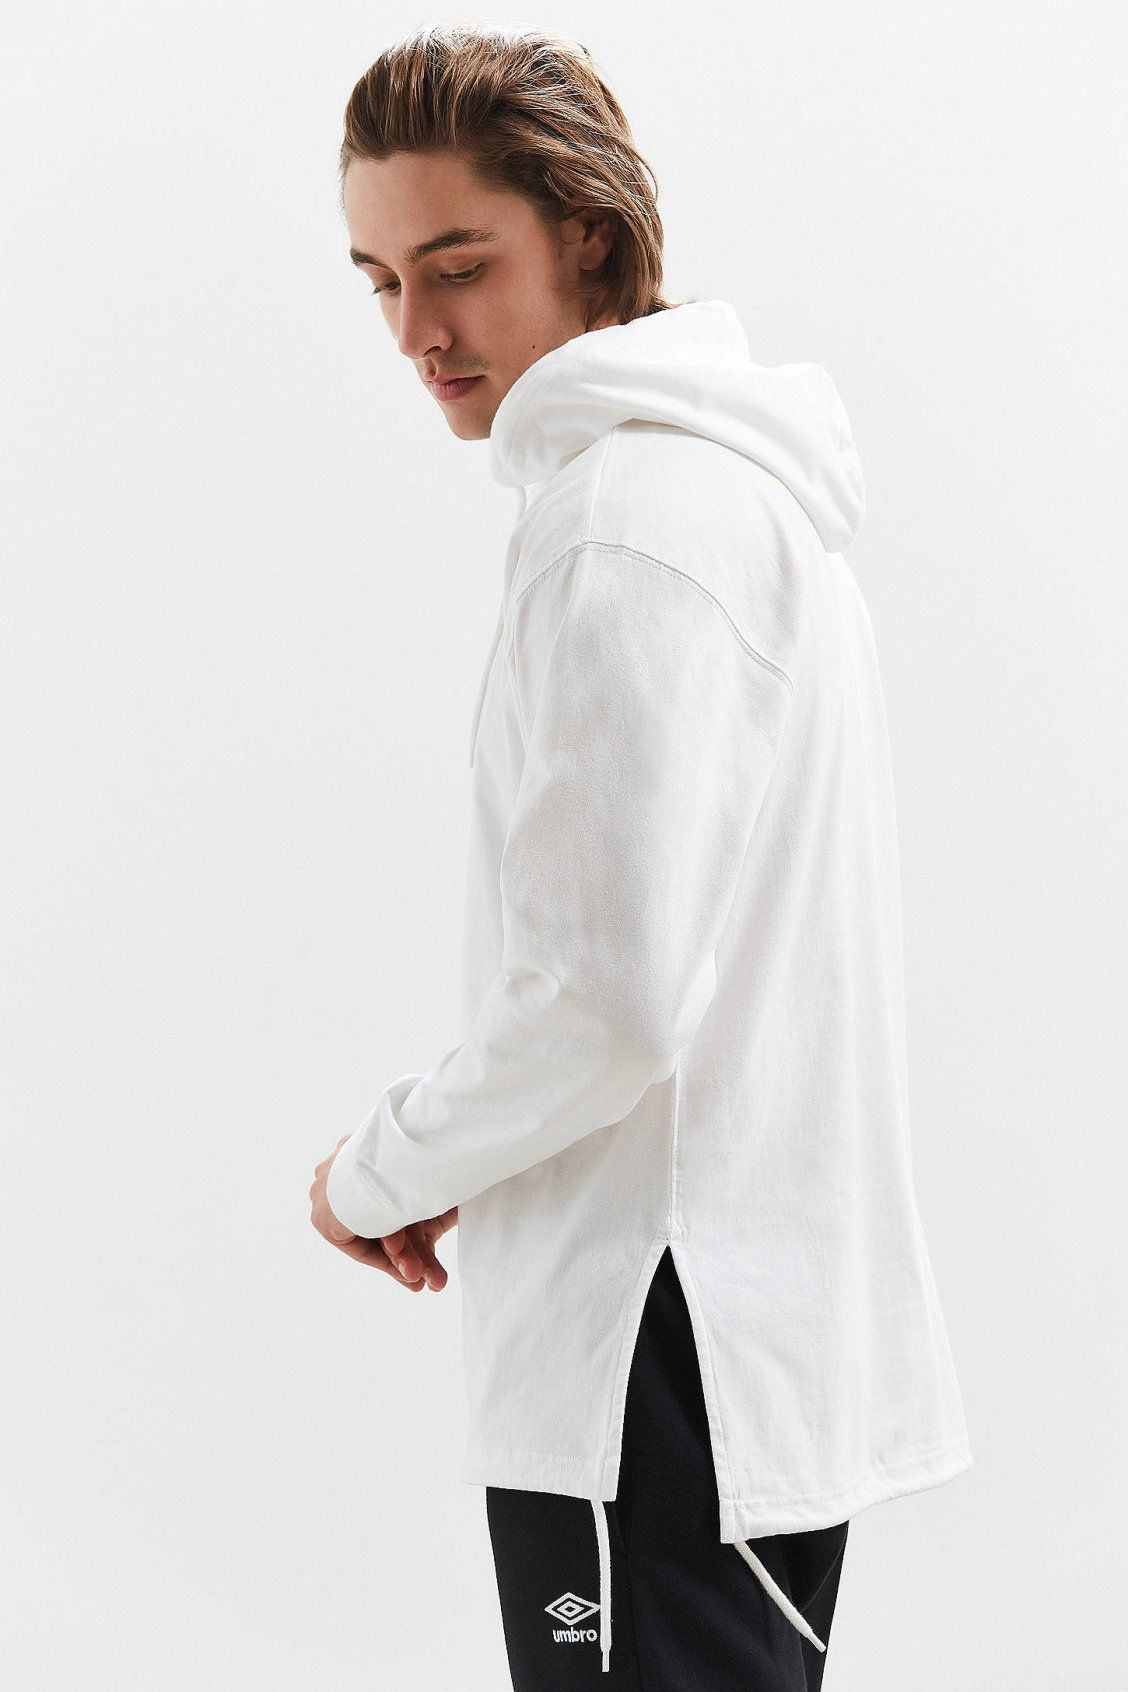 Uo tie split hooded long sleeve tee urban outfitters new